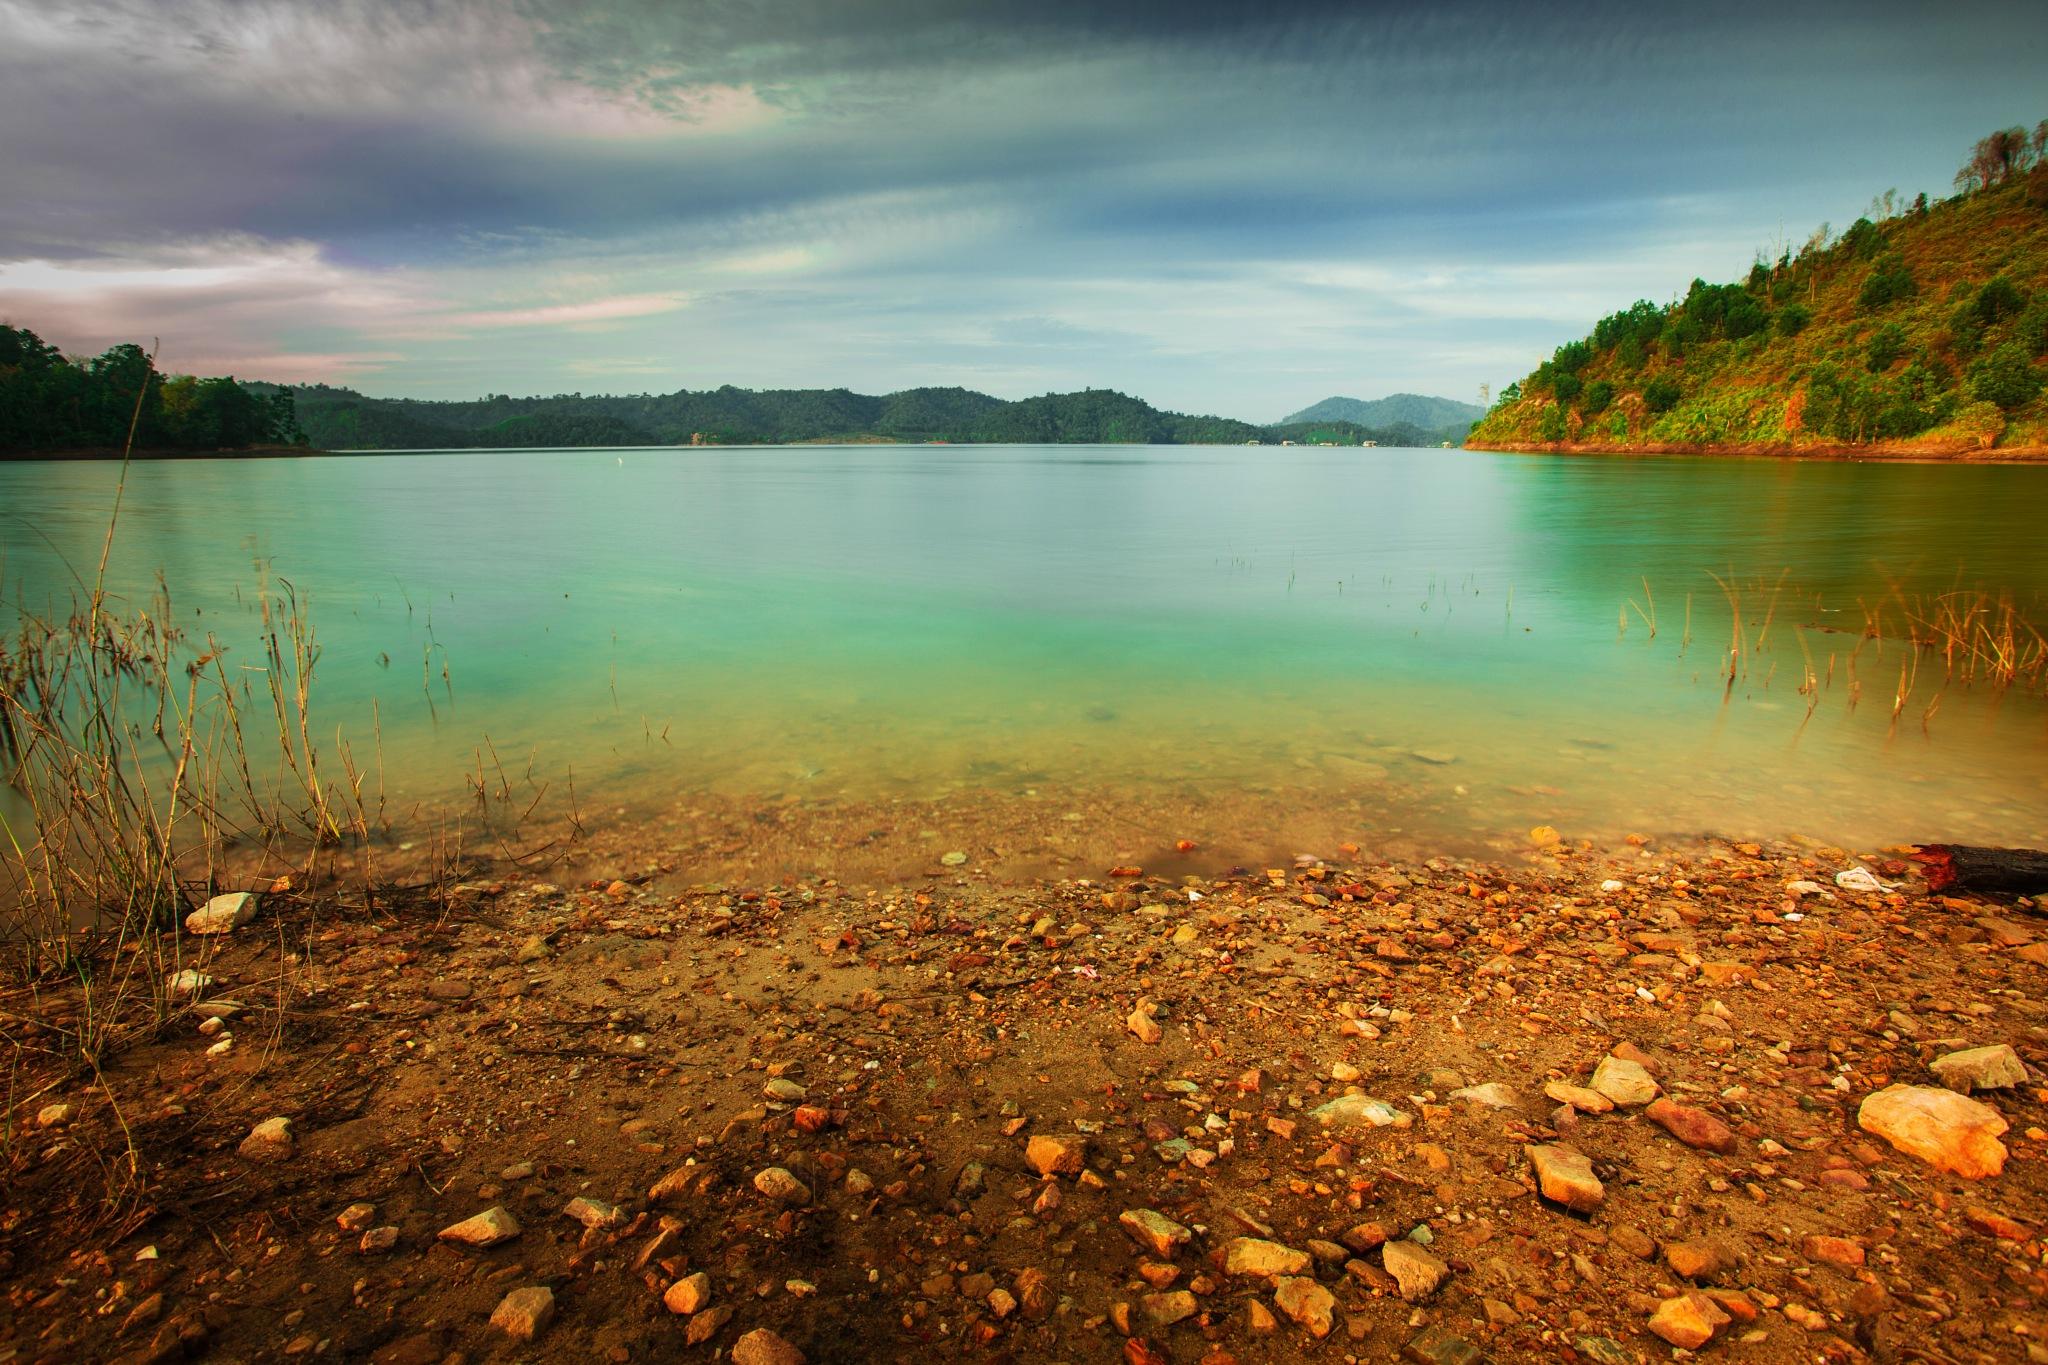 Koto Panjang Lake 1 by Syafri Gamal